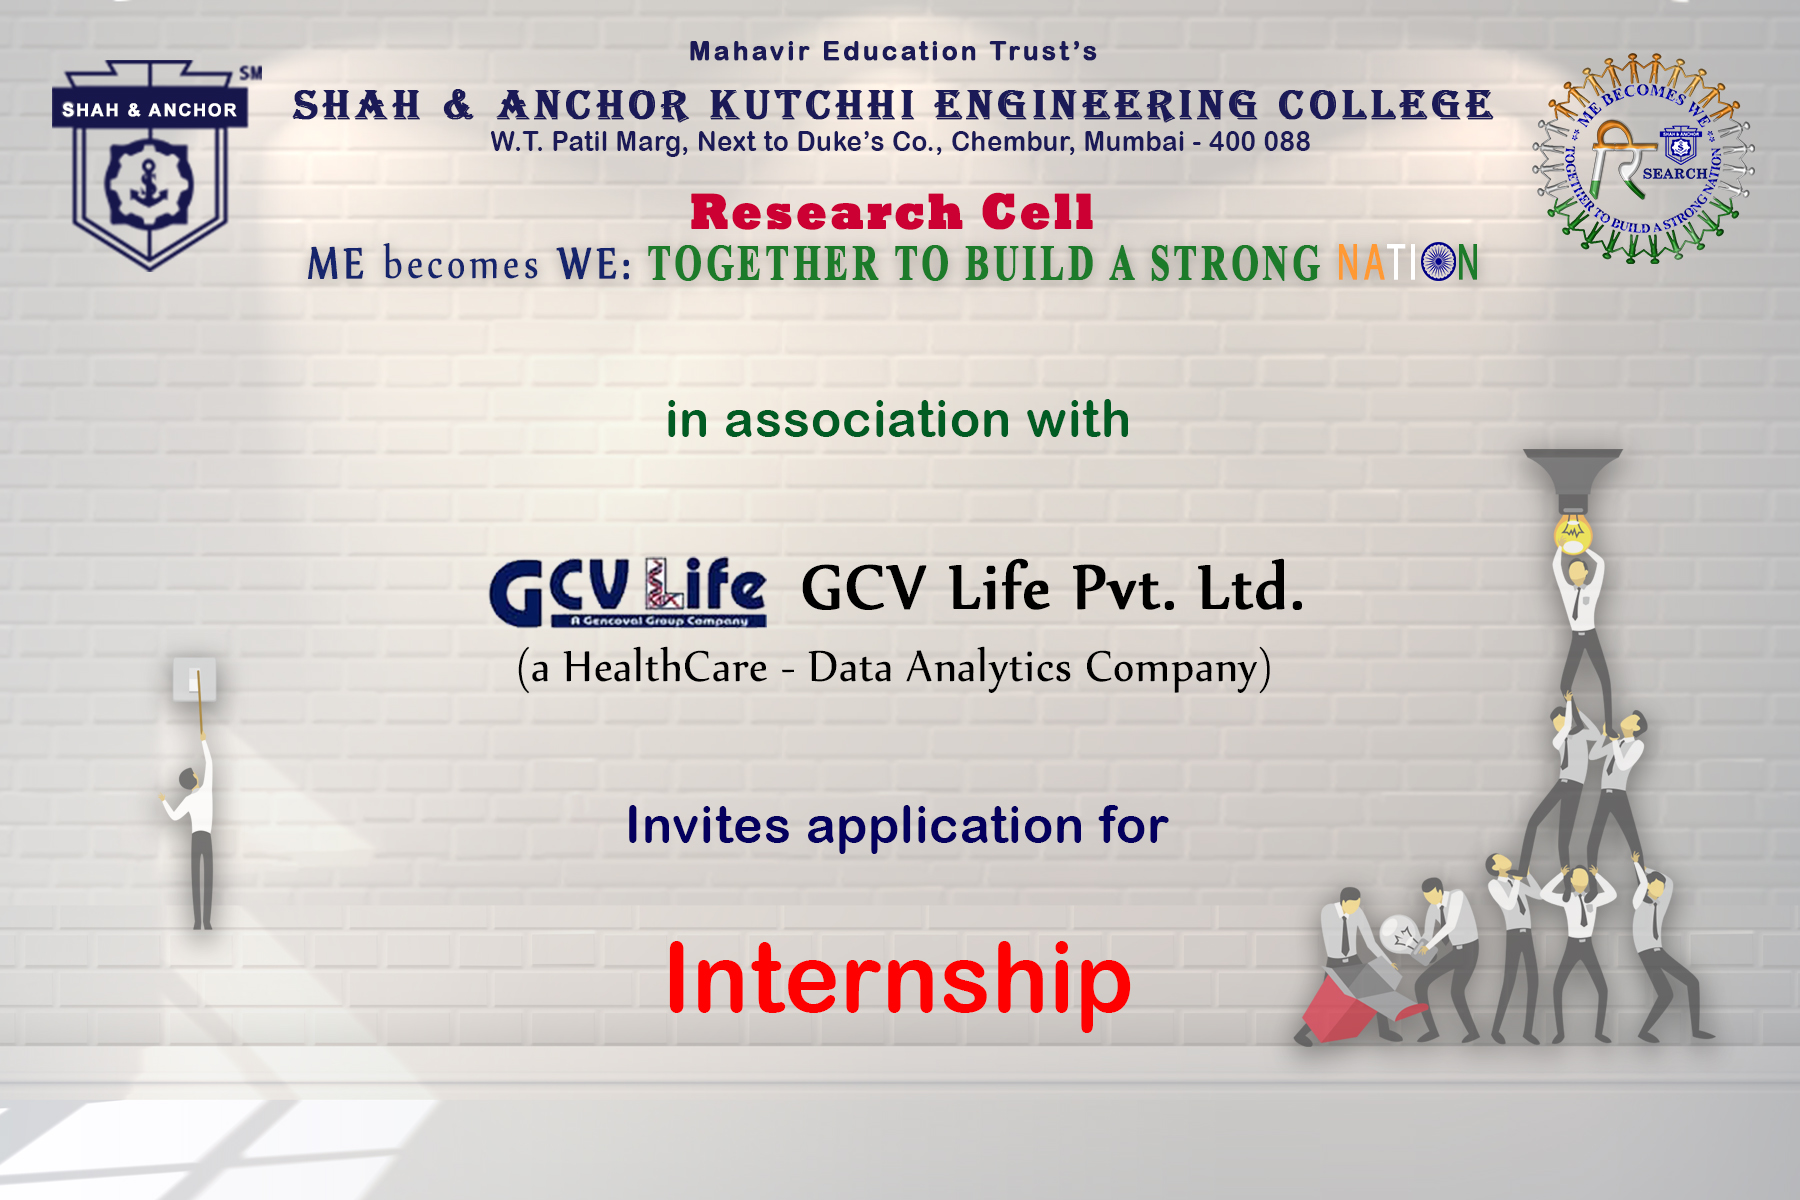 GCV LIFE PVT. LTD